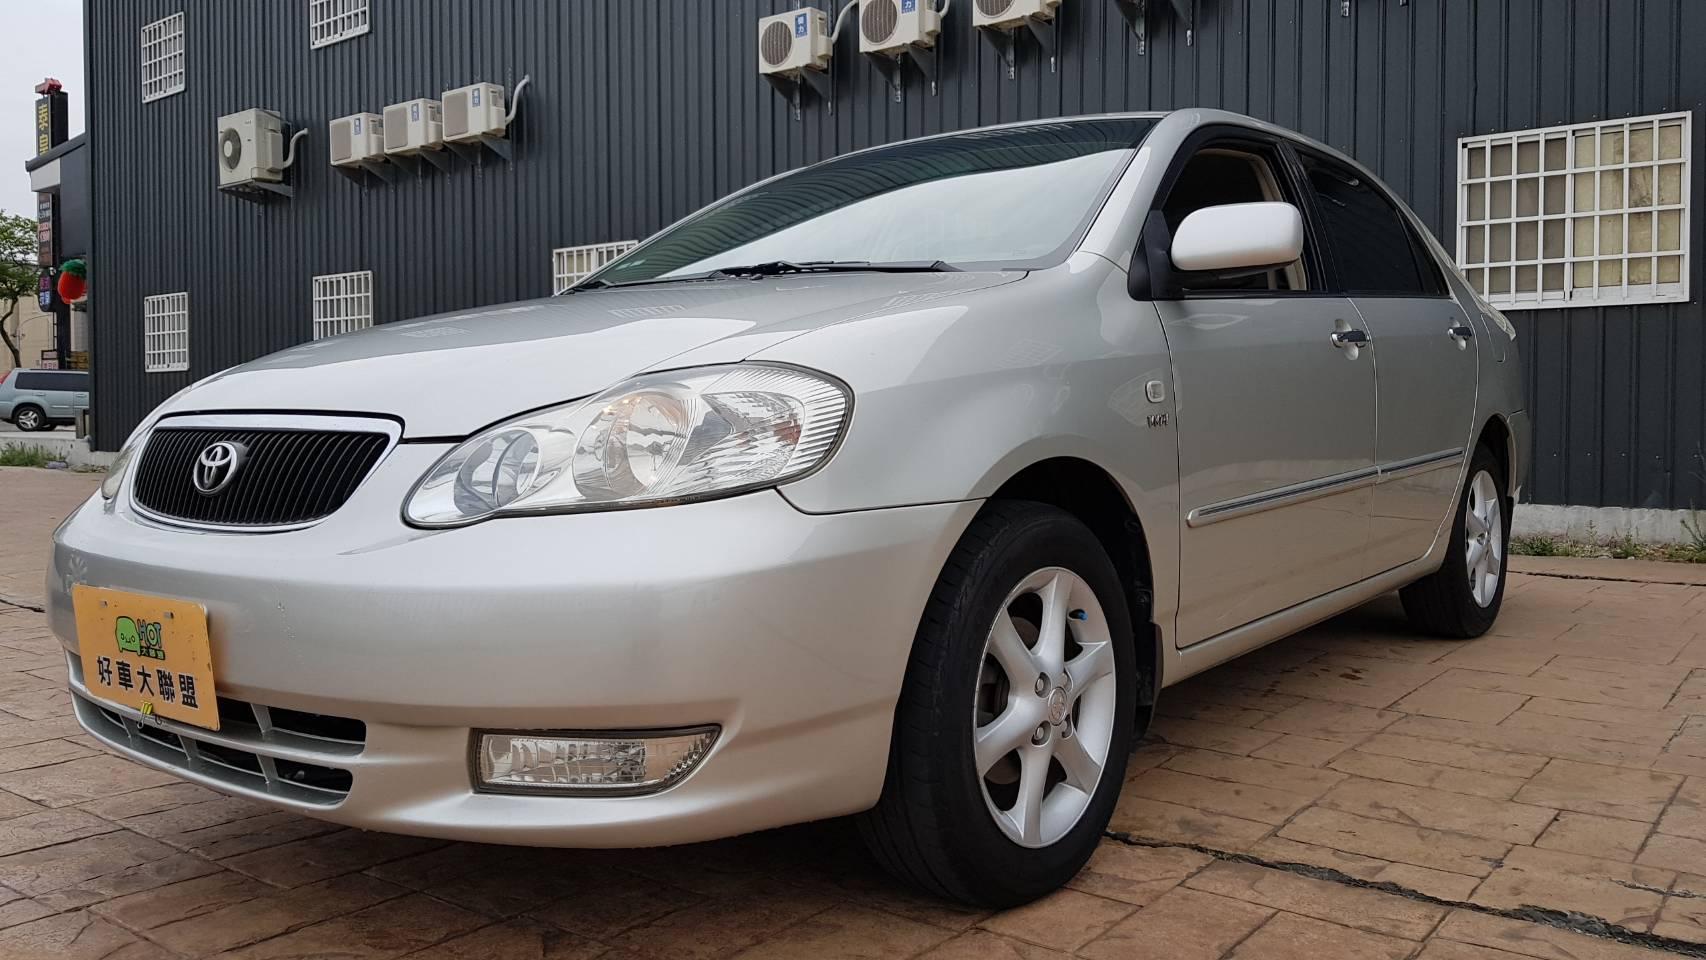 2001 Toyota Corolla altis